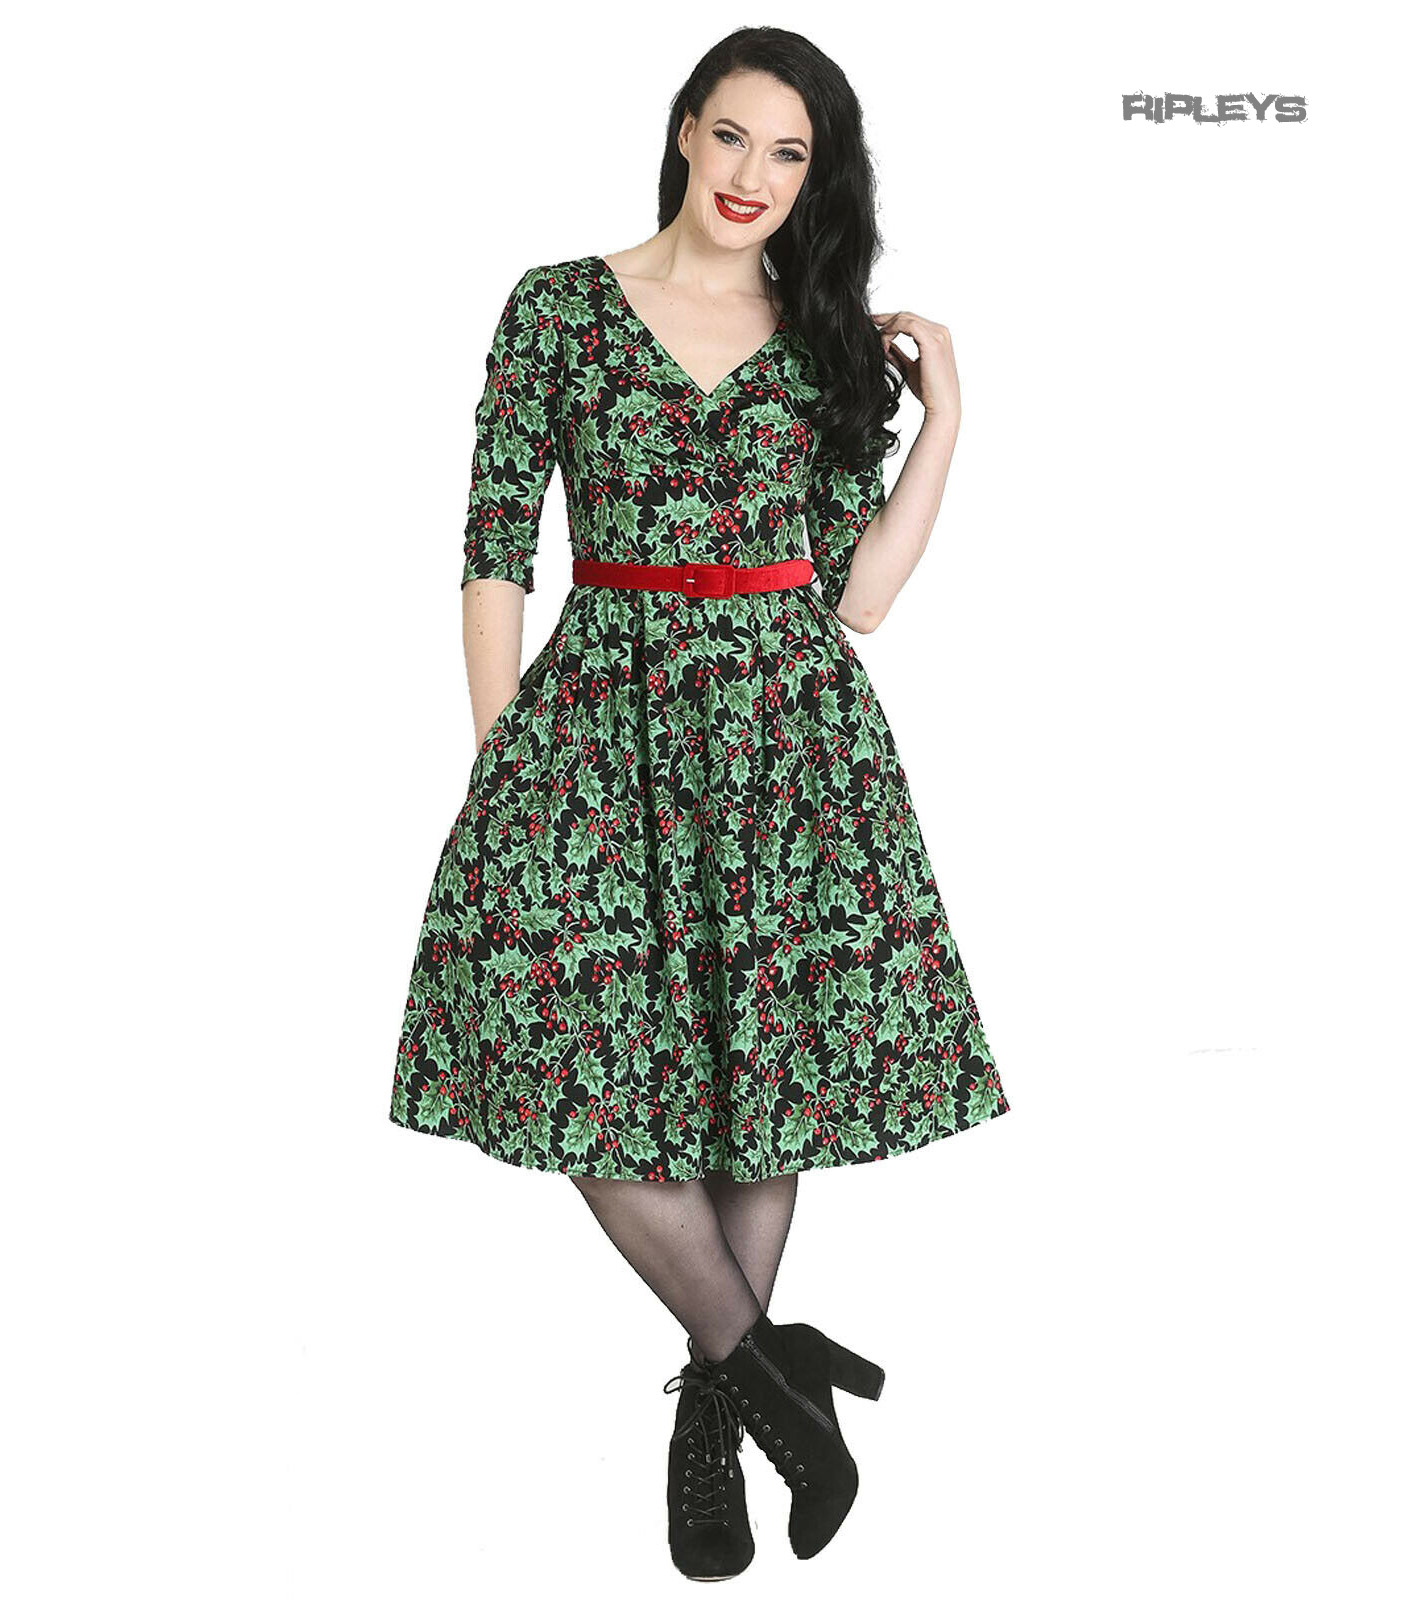 Hell-Bunny-50s-Pin-Up-Navidad-Vestido-Festivo-Rojo-Holly-Berry-Negro-Todos-los-Tamanos miniatura 18